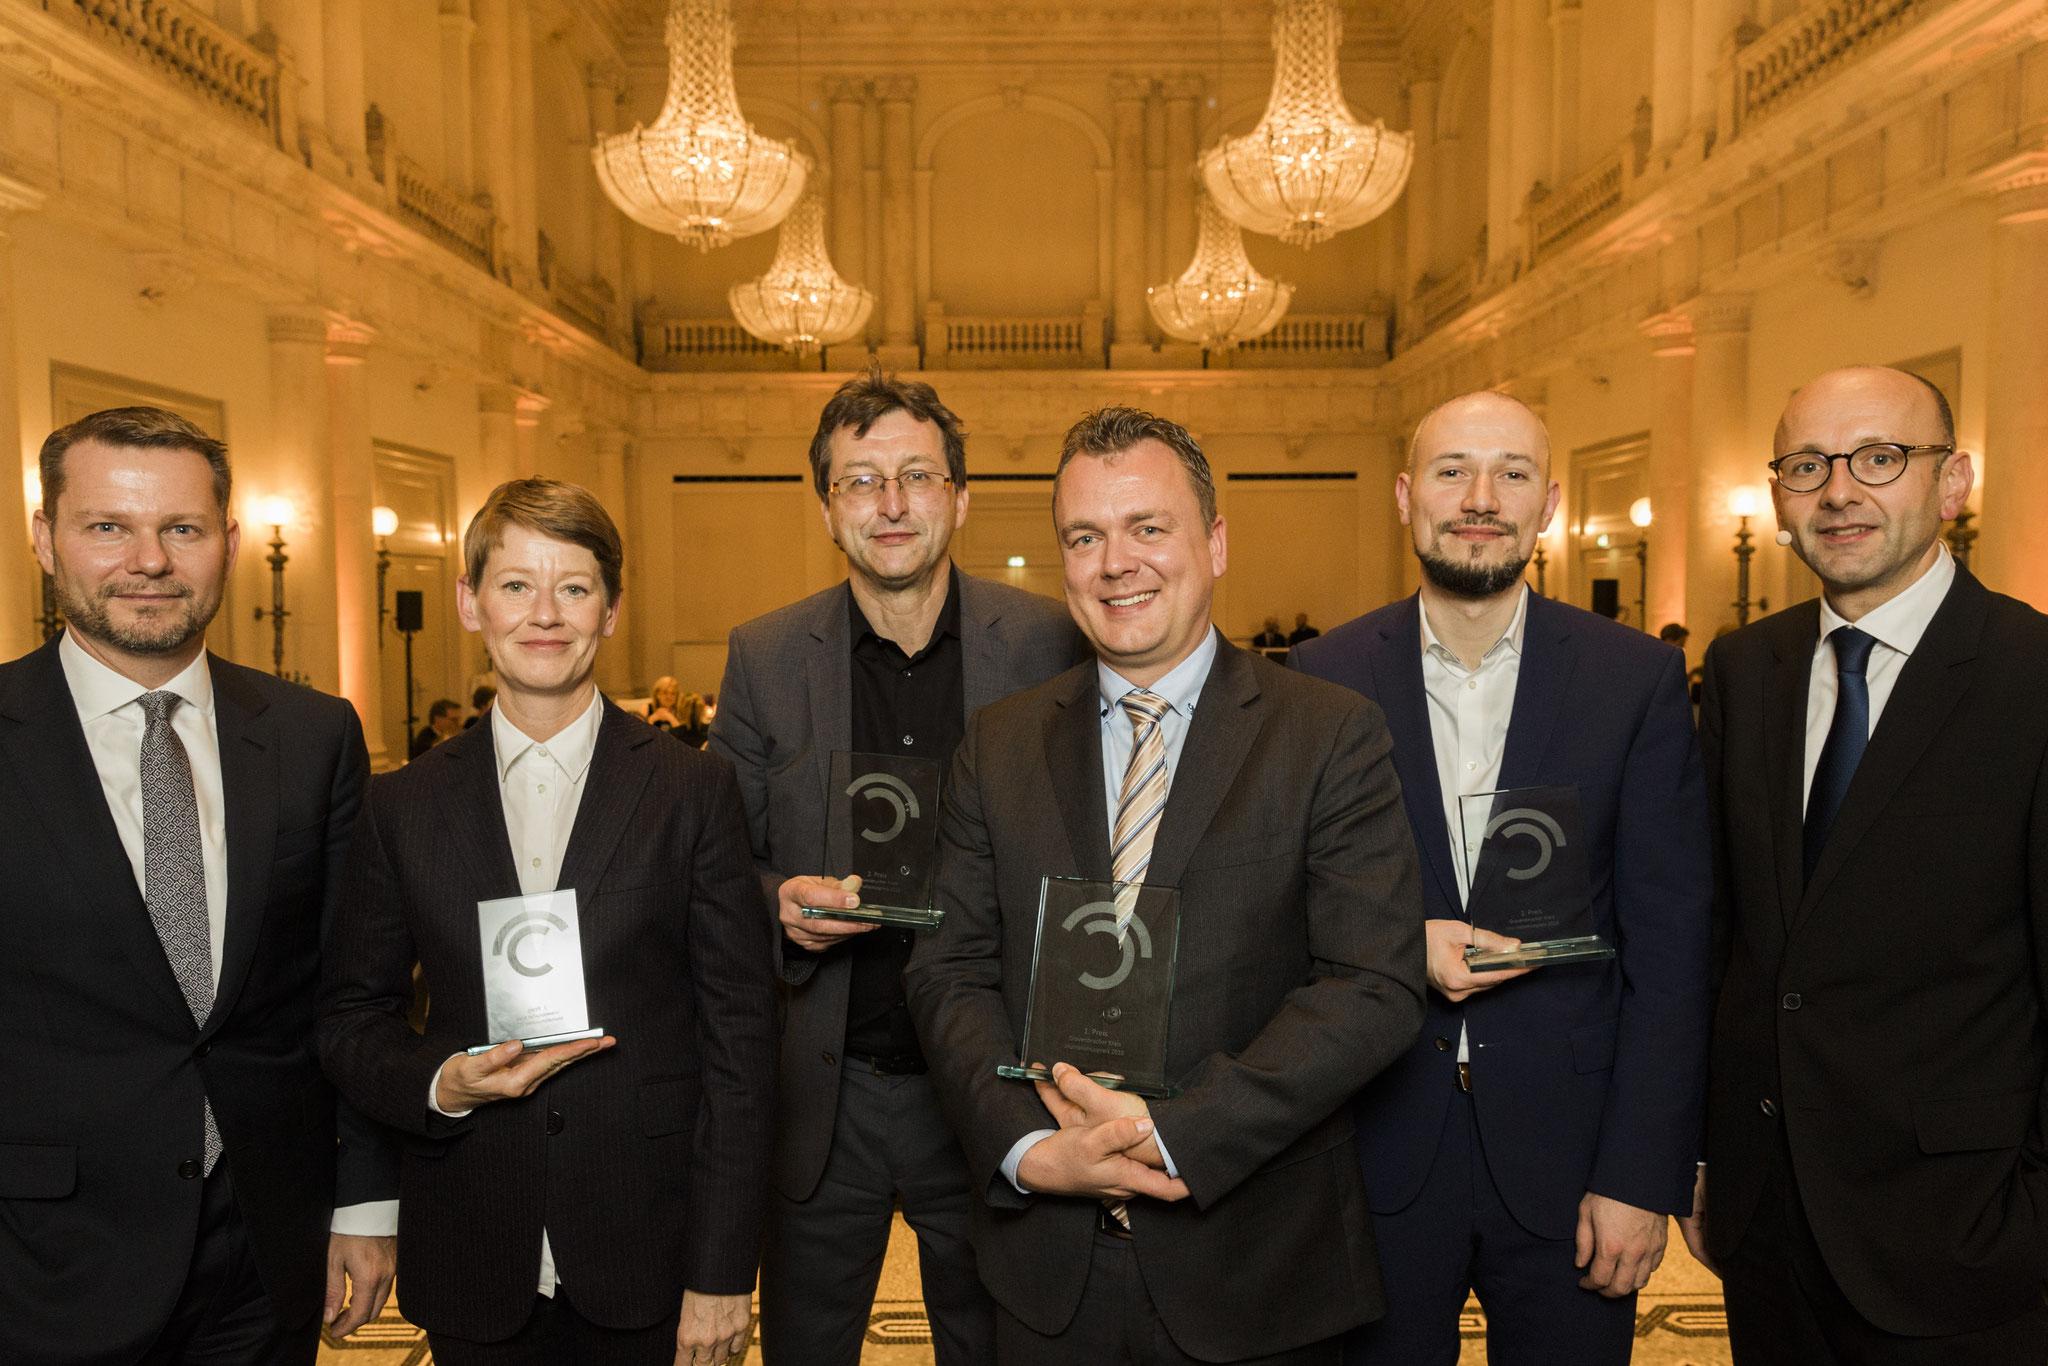 Dirk Andres, Catherine Hoffmann, Martin-Werner Buchenau, Lars Petersen, Anis Micijevic, Lucas Flöther. Prize-winners and laudators Journalism Prize © 2018 Sven Döring